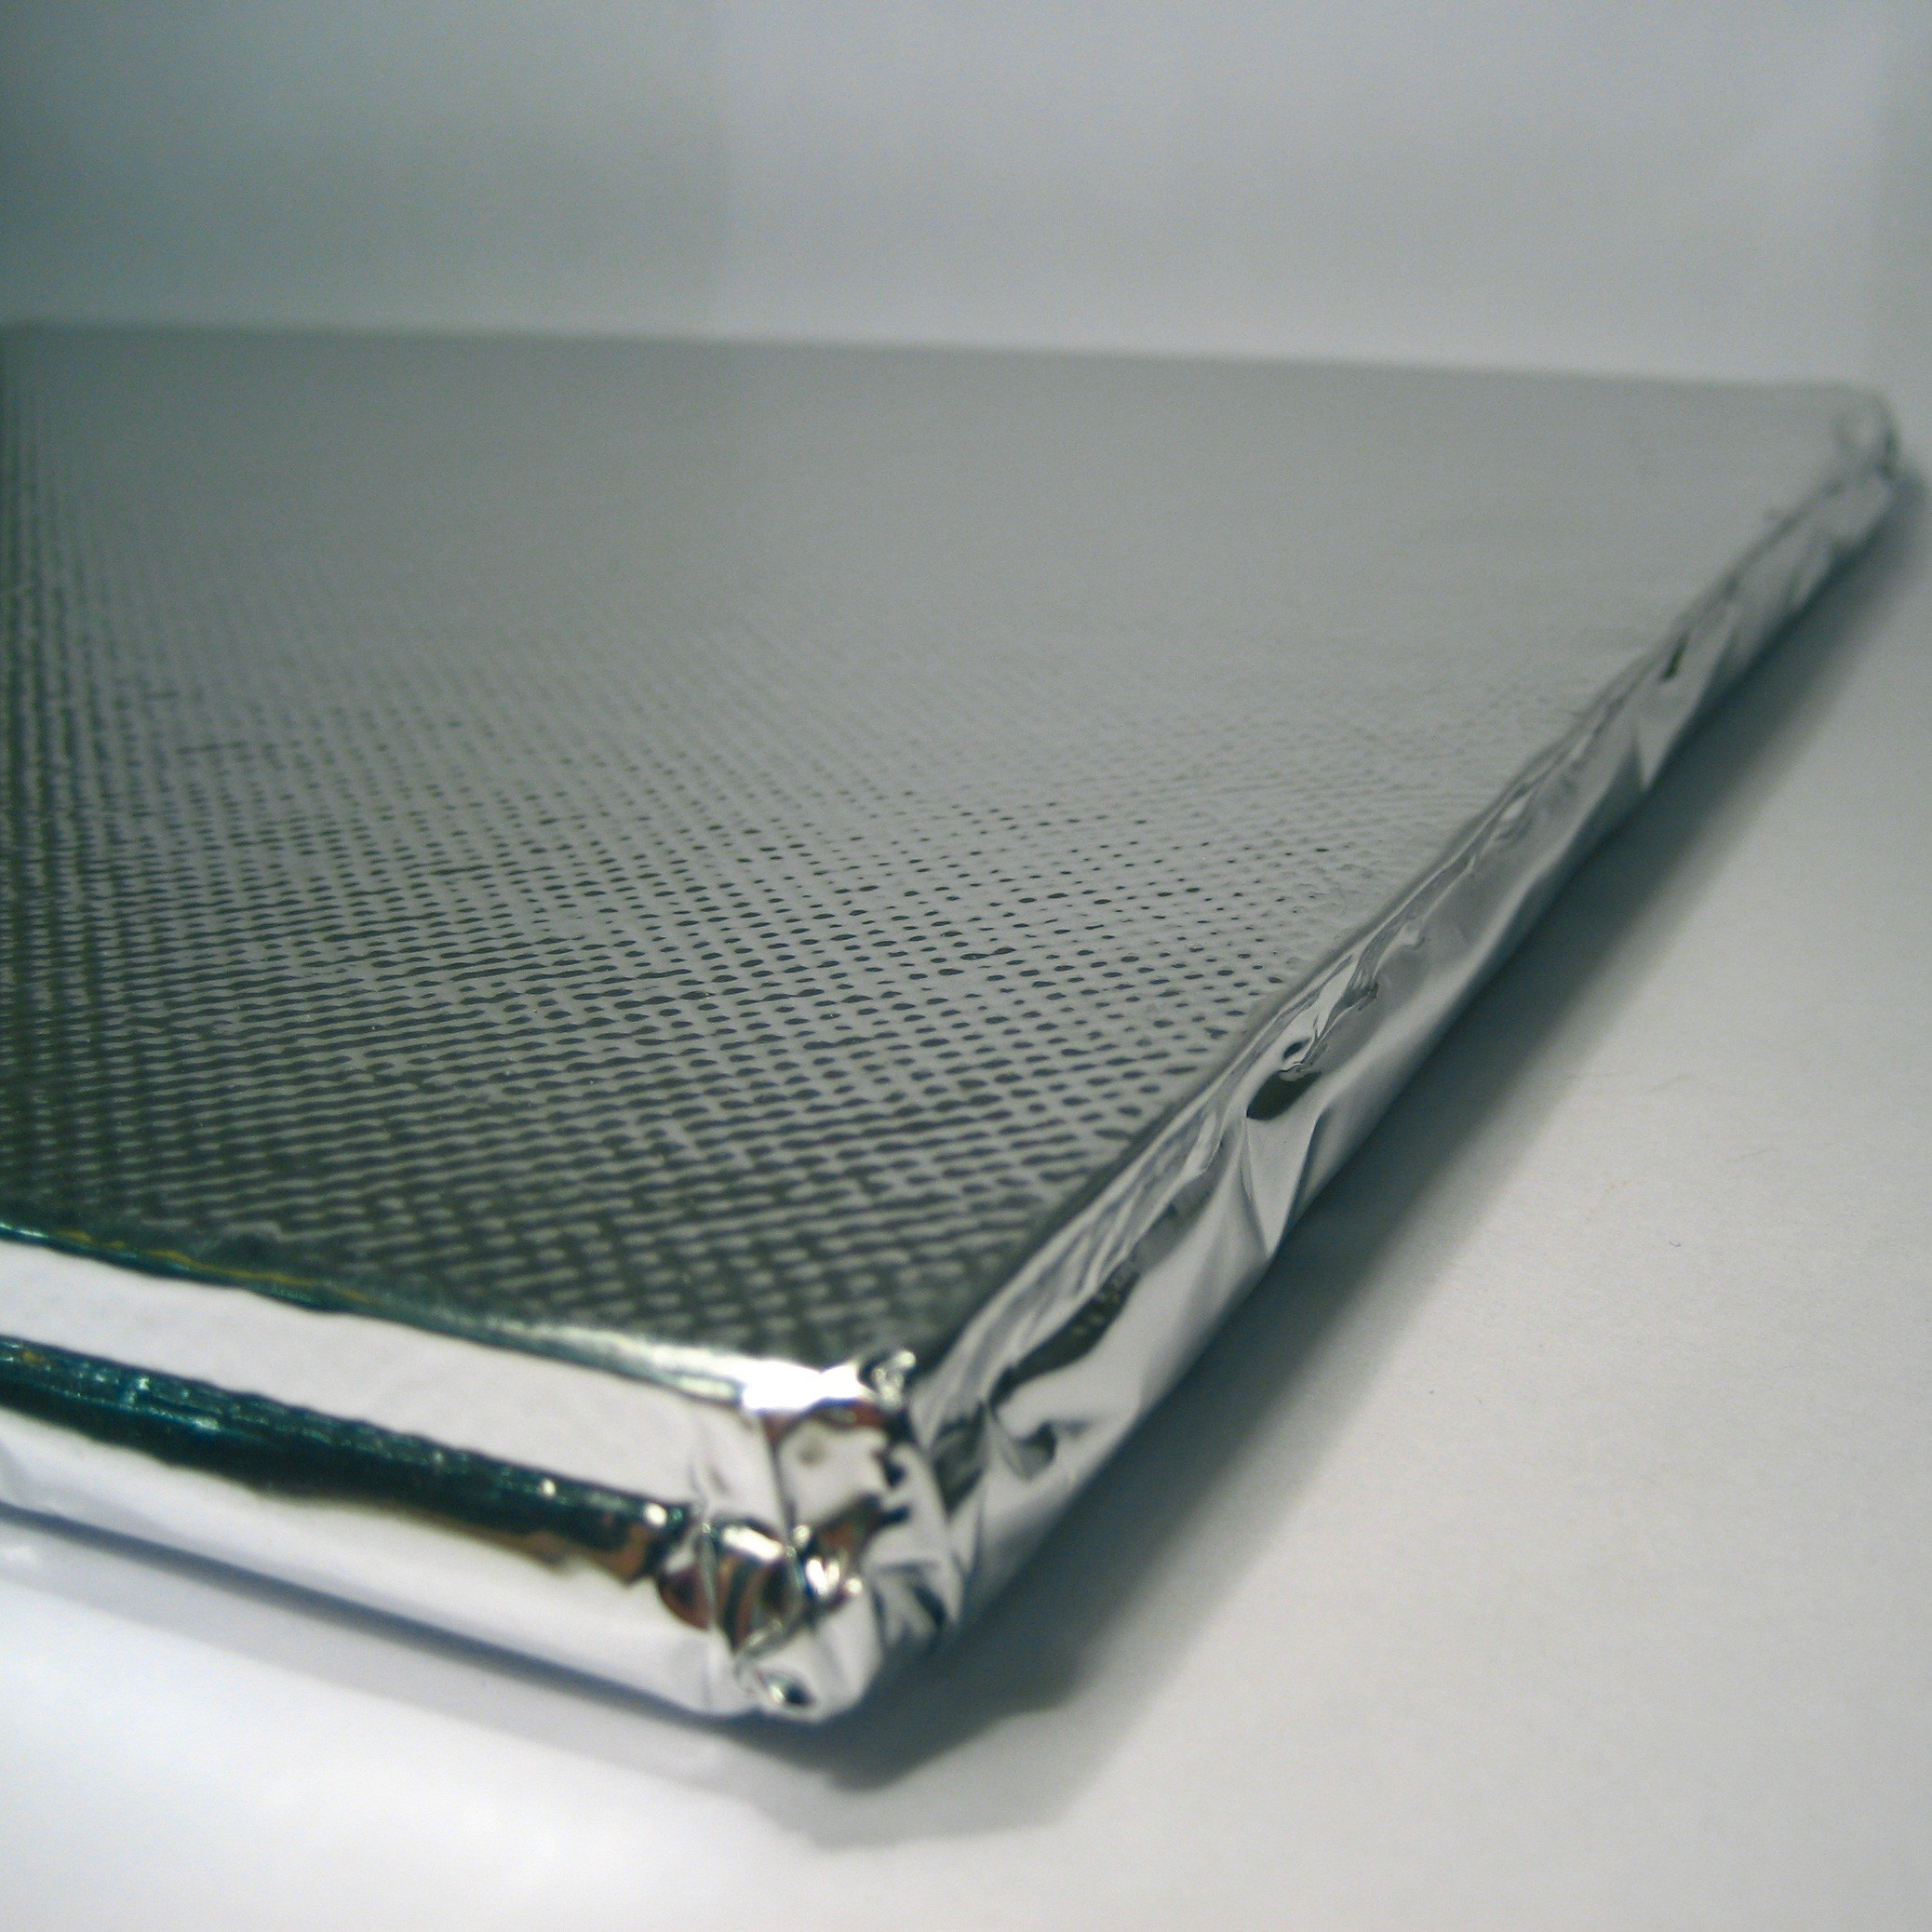 PANEL MICROPOROSO ISO AL 20 1100x150x20 MM